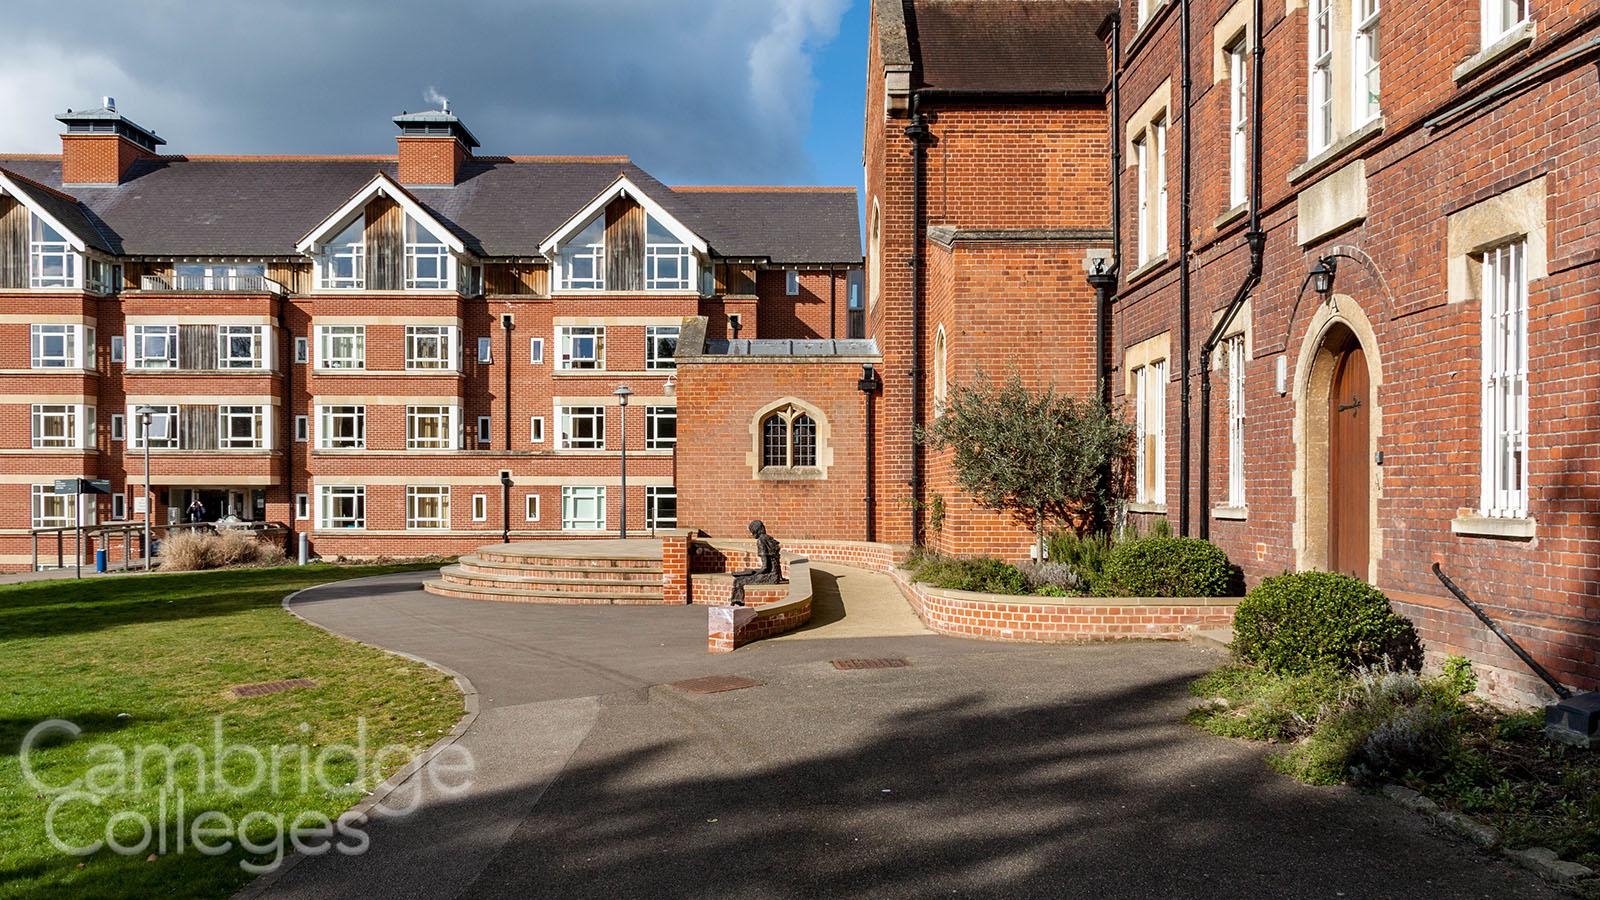 St Edmund's college Brian Heap building